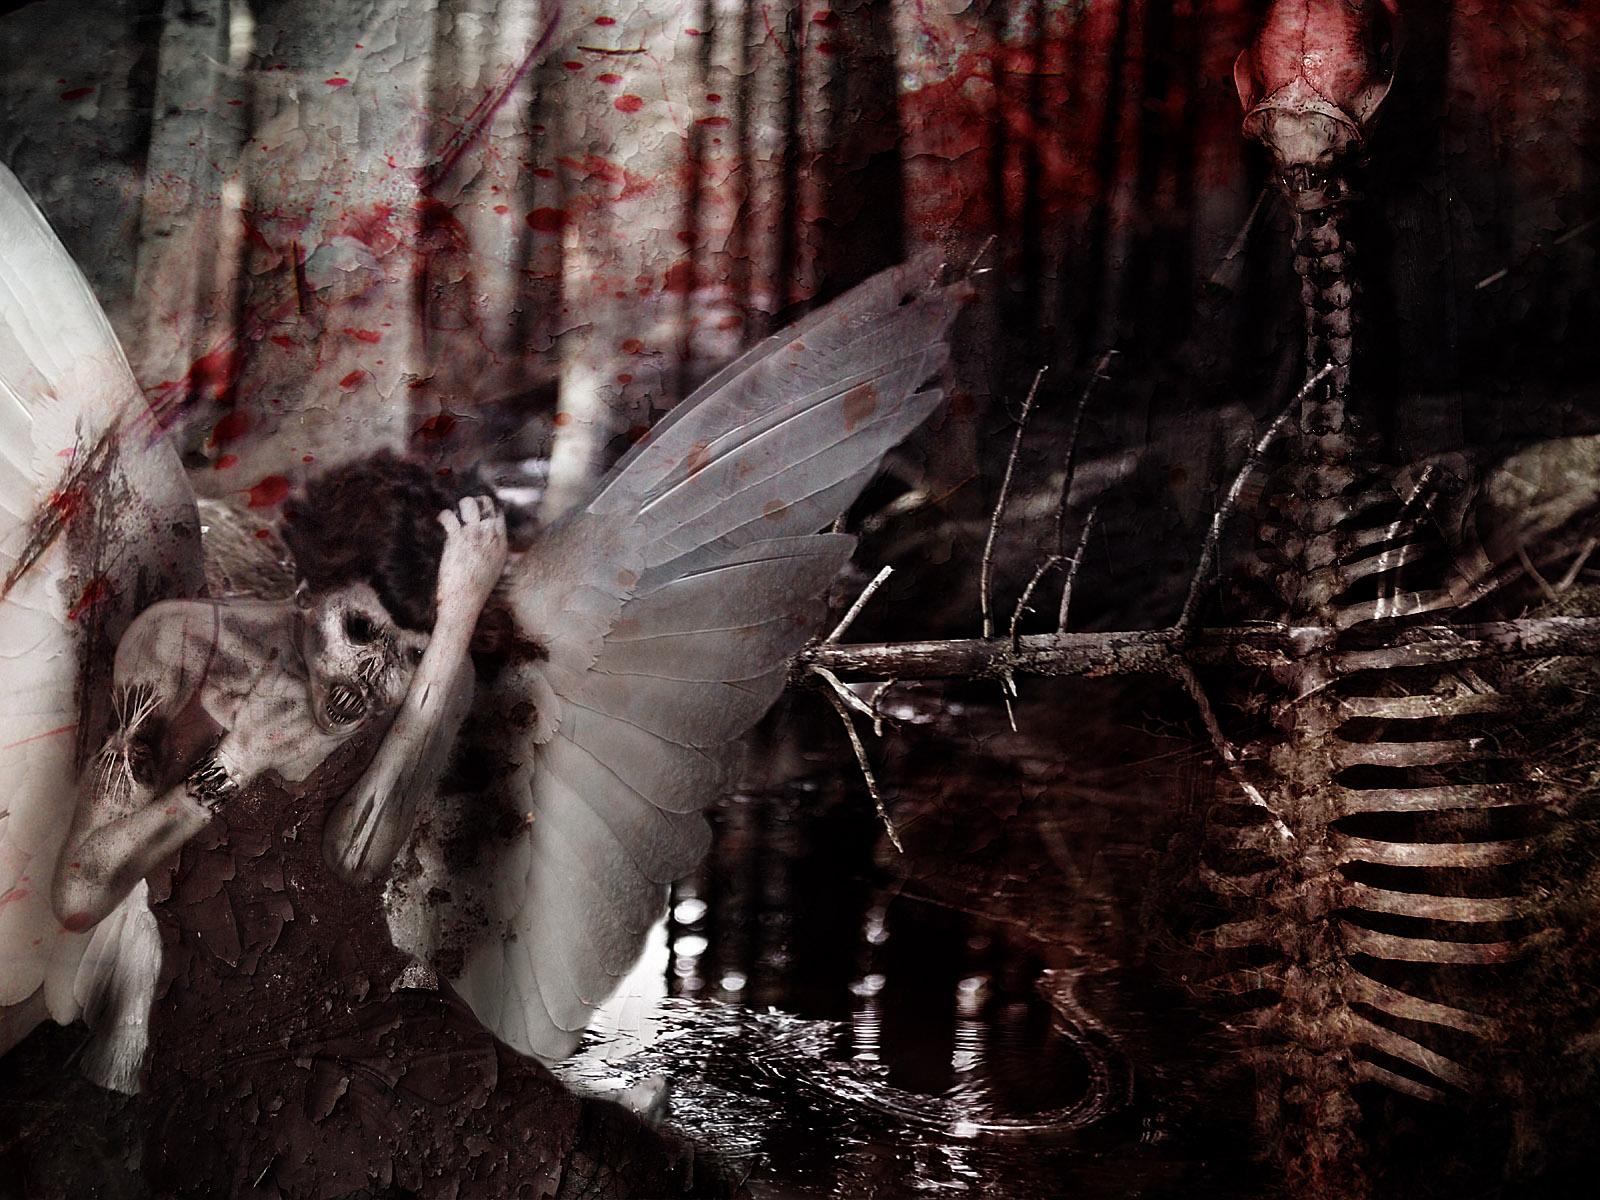 21 horror wallpaper high resolution collection part 3 - Dark gothic angel wallpaper ...